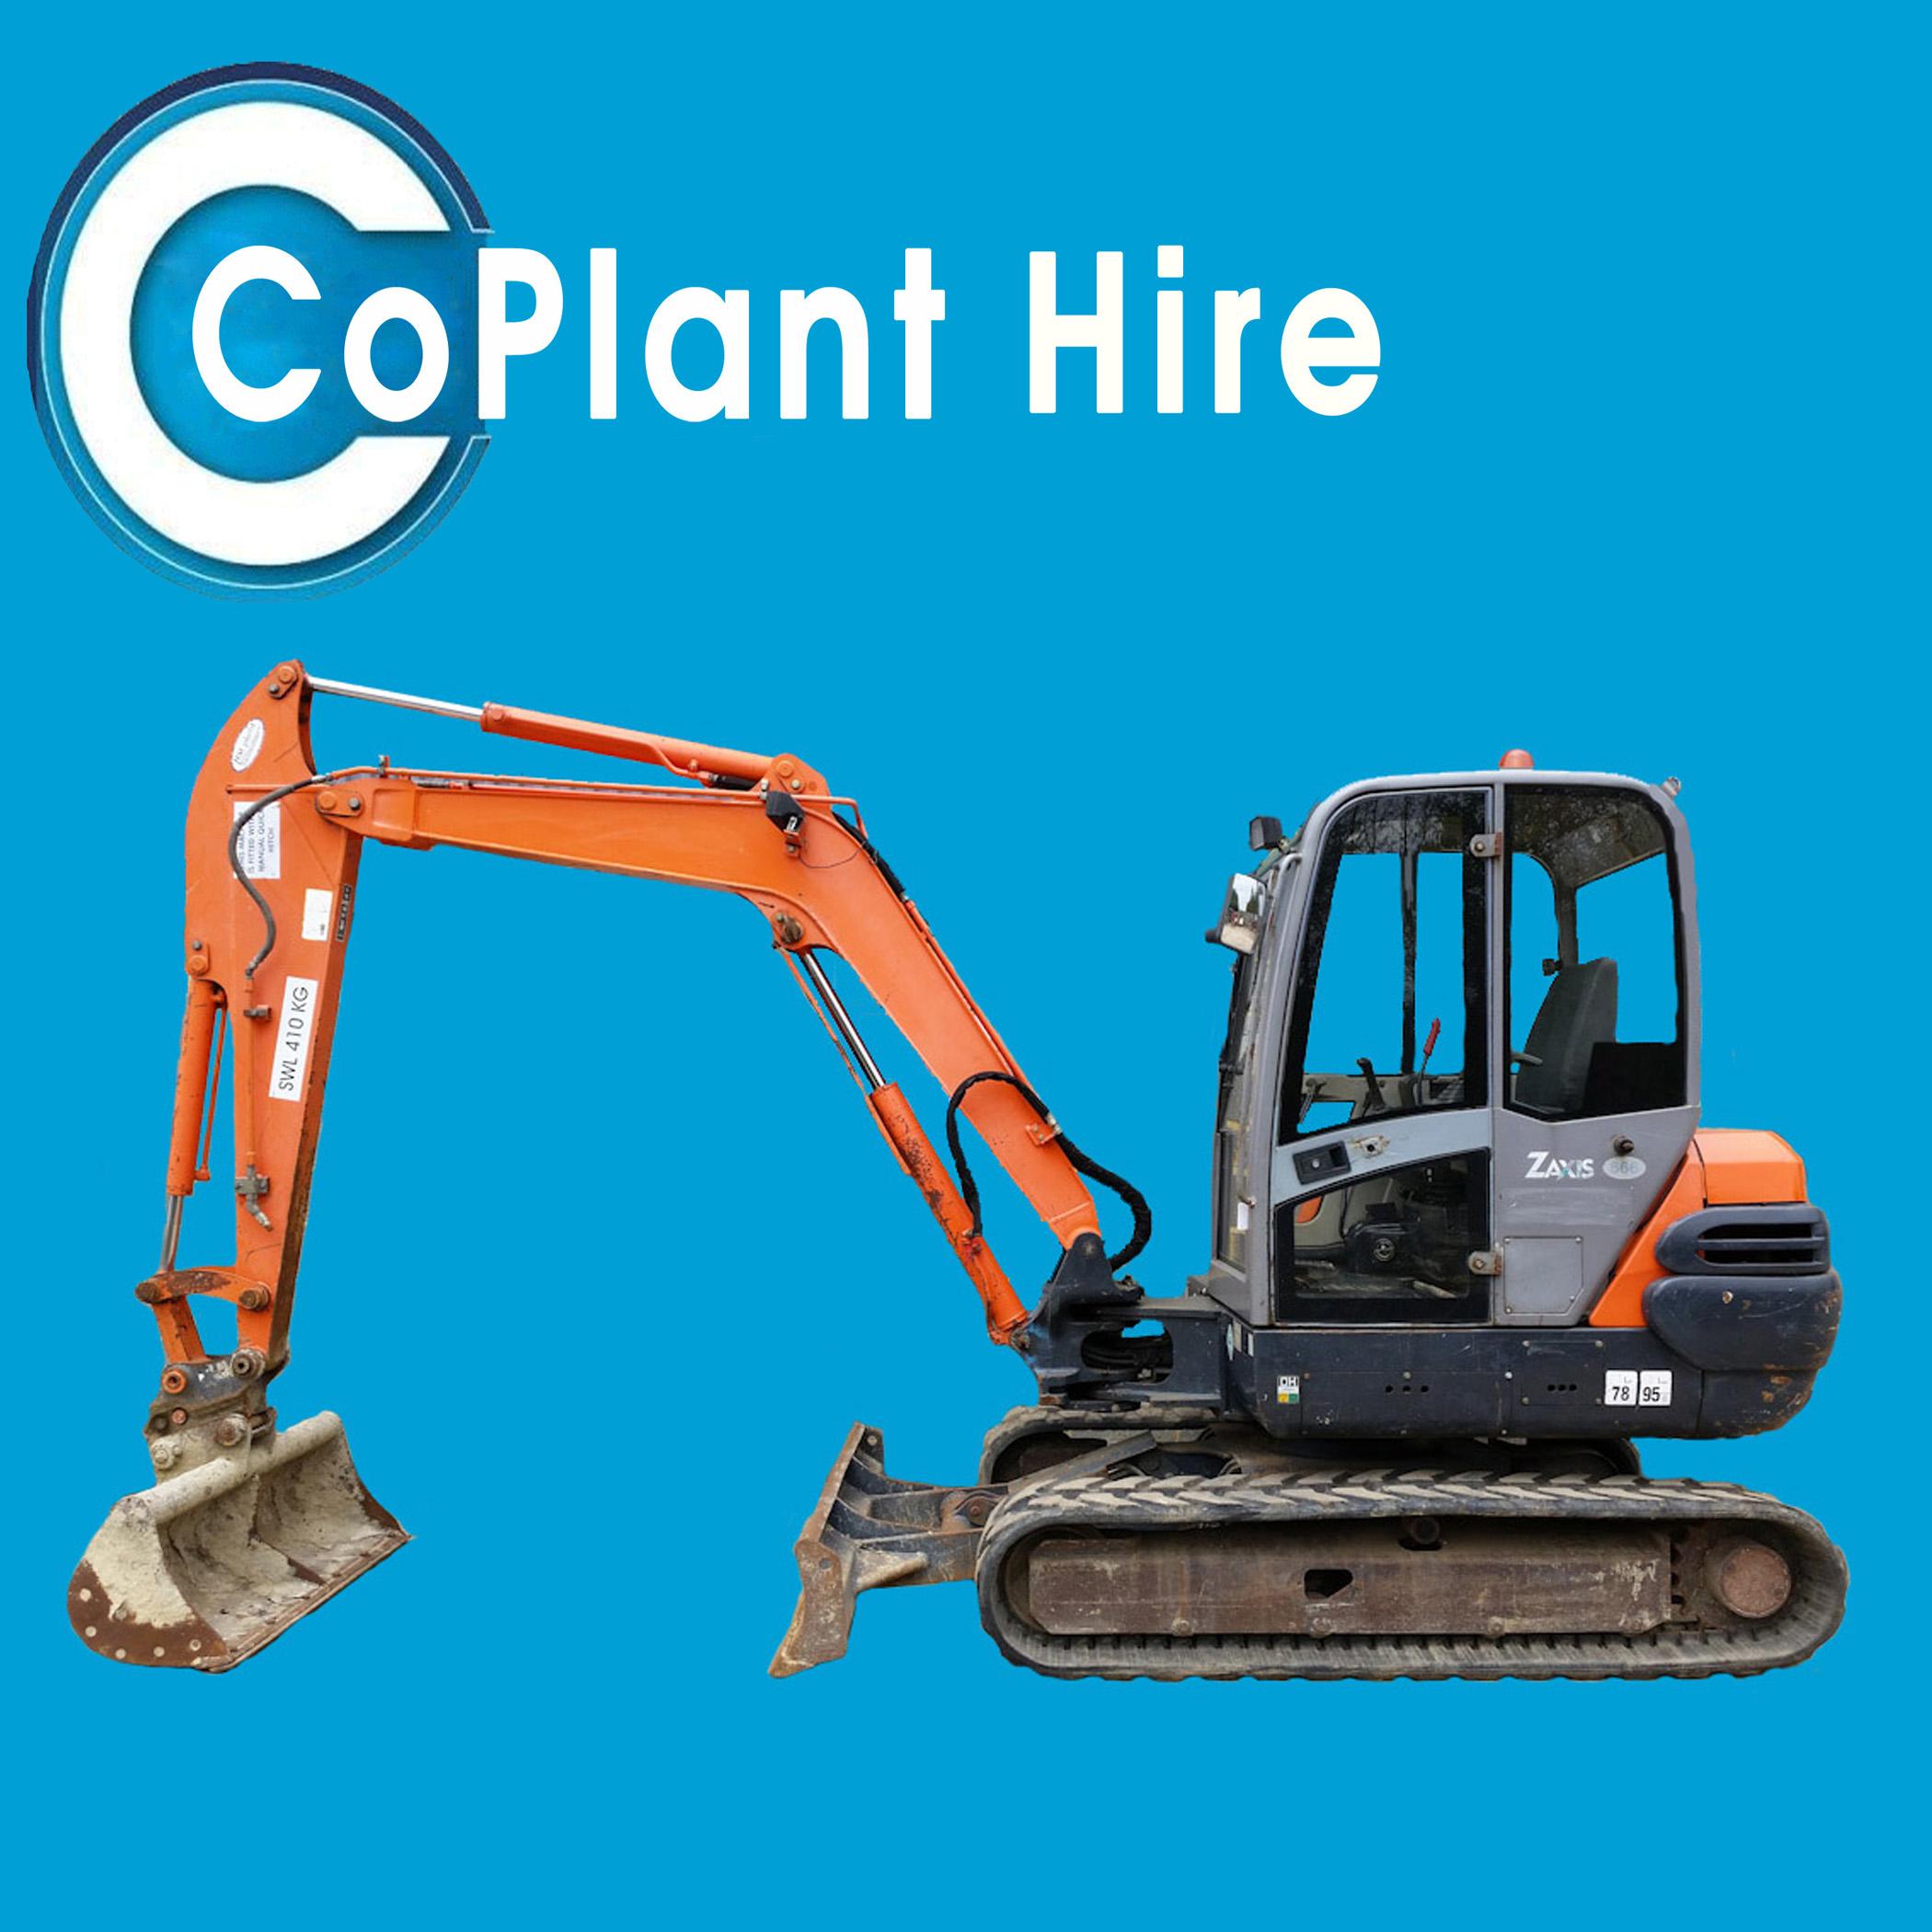 5 ton digger for hire kent